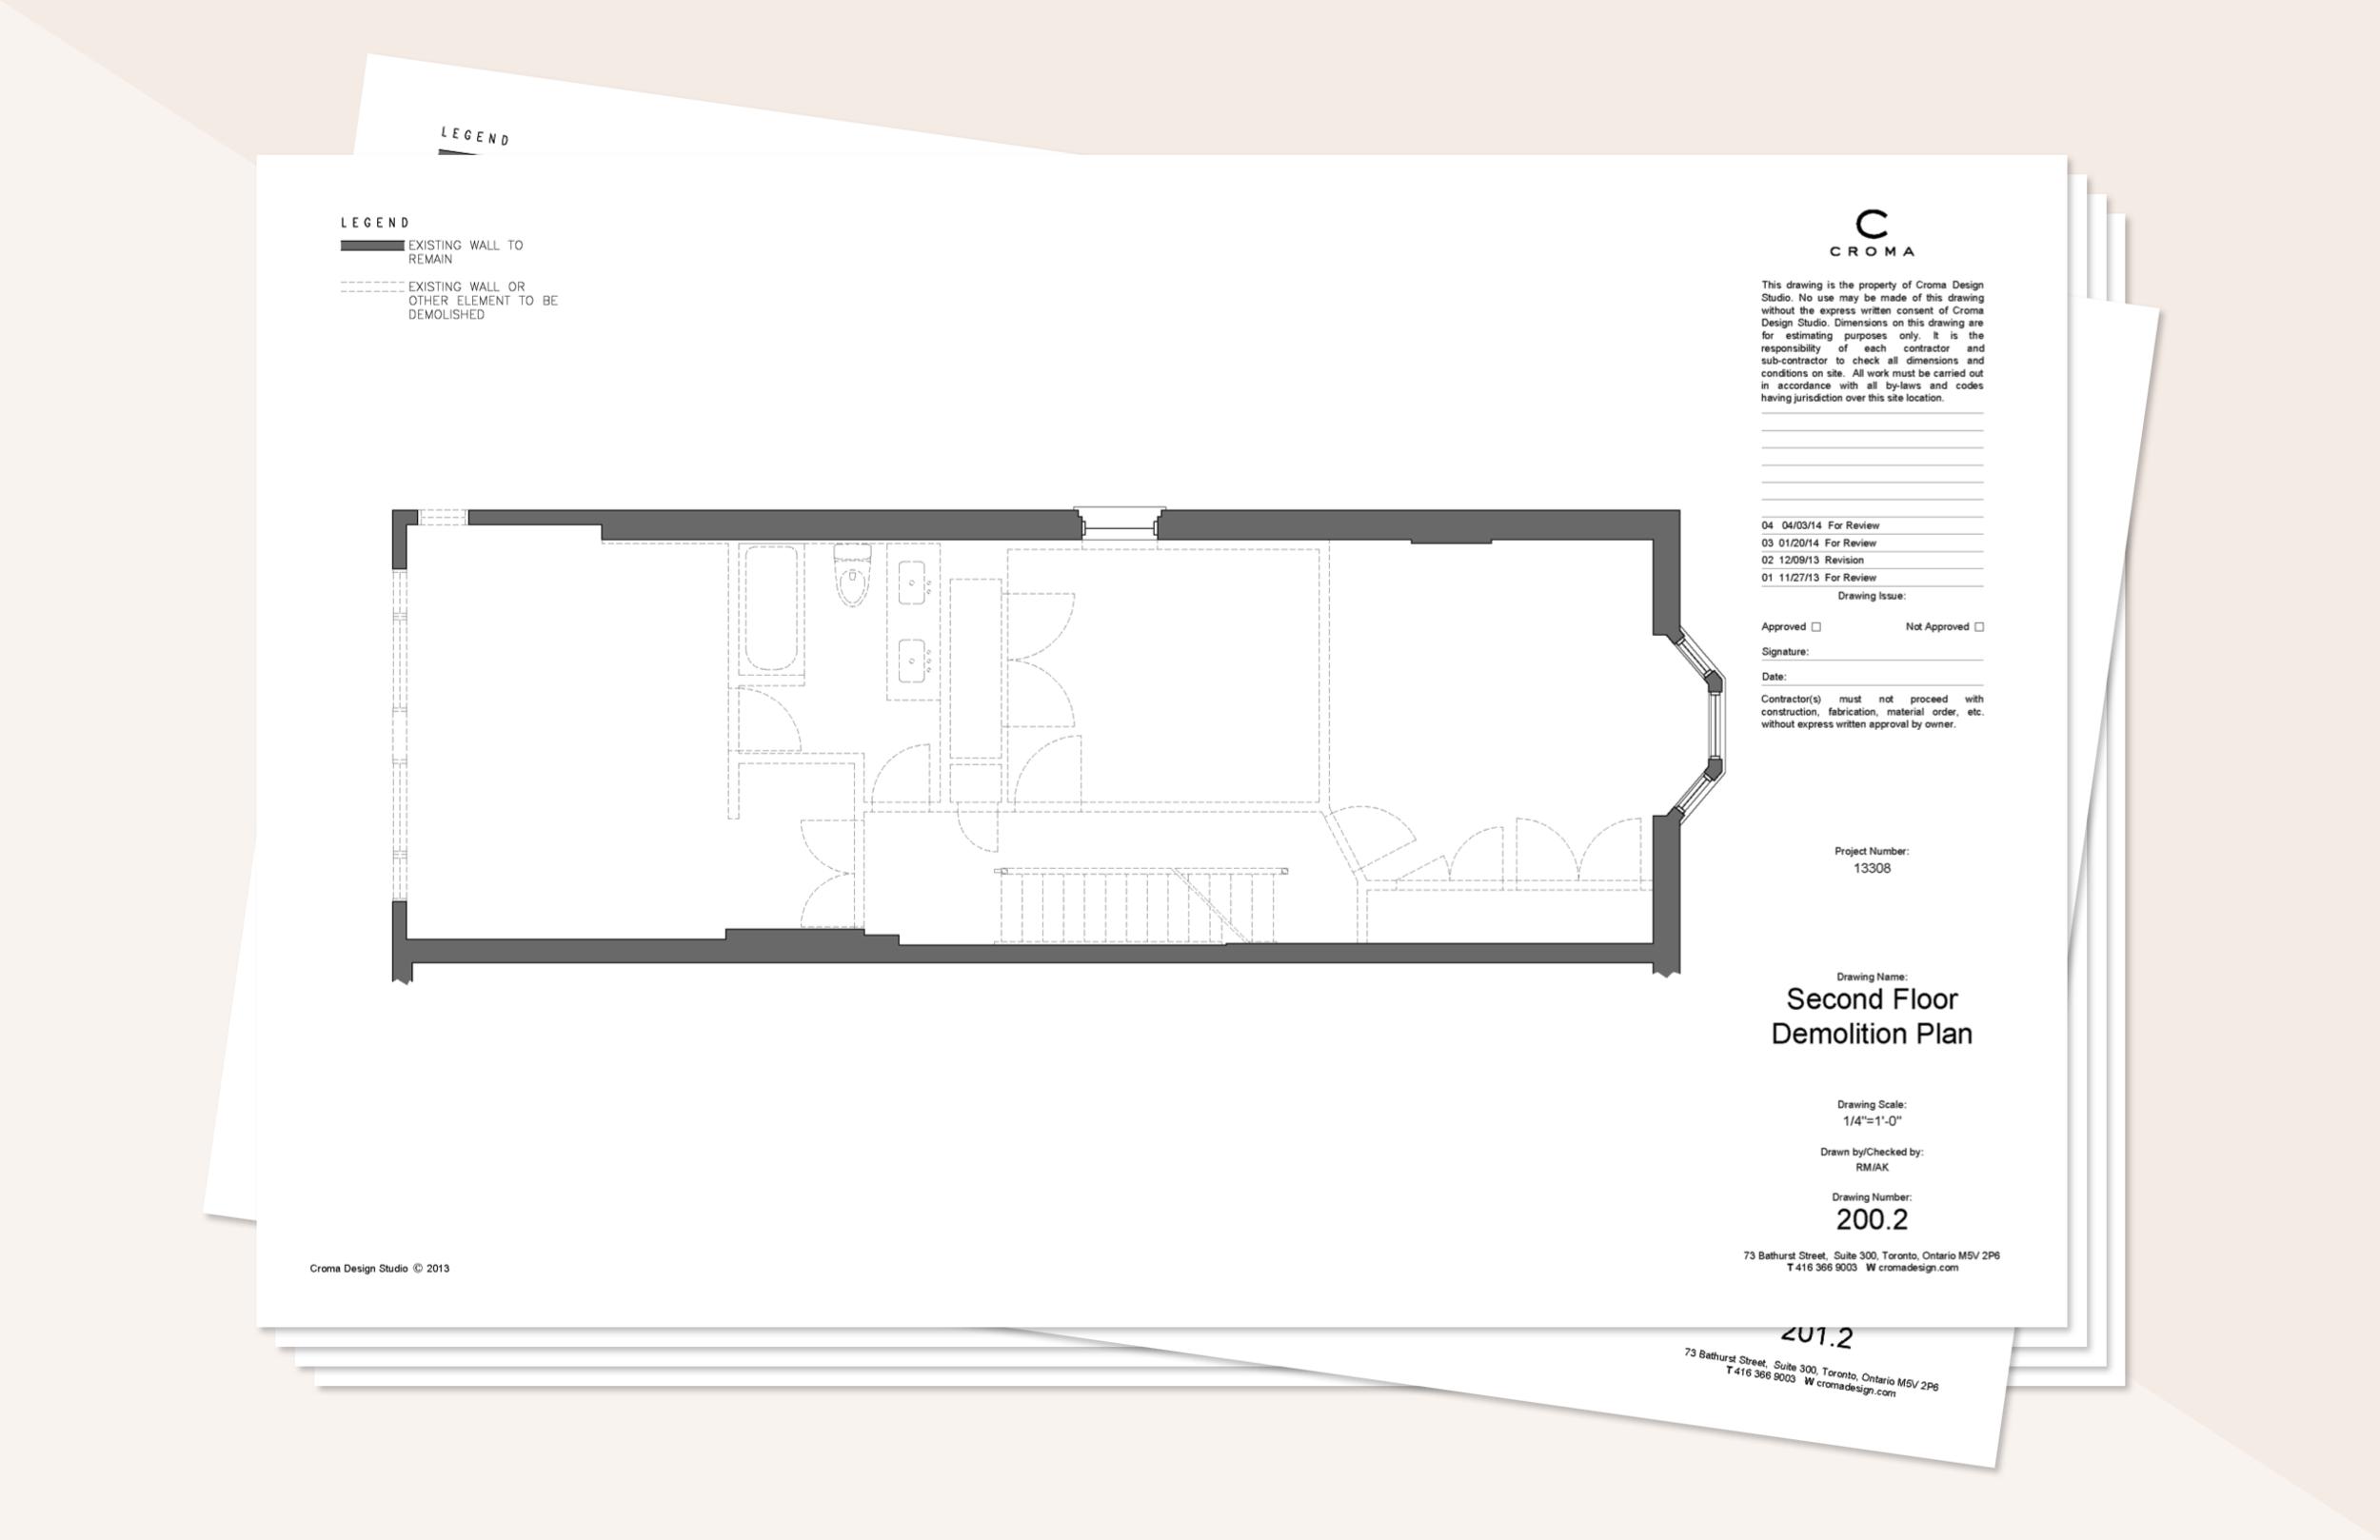 8. Construction Documents